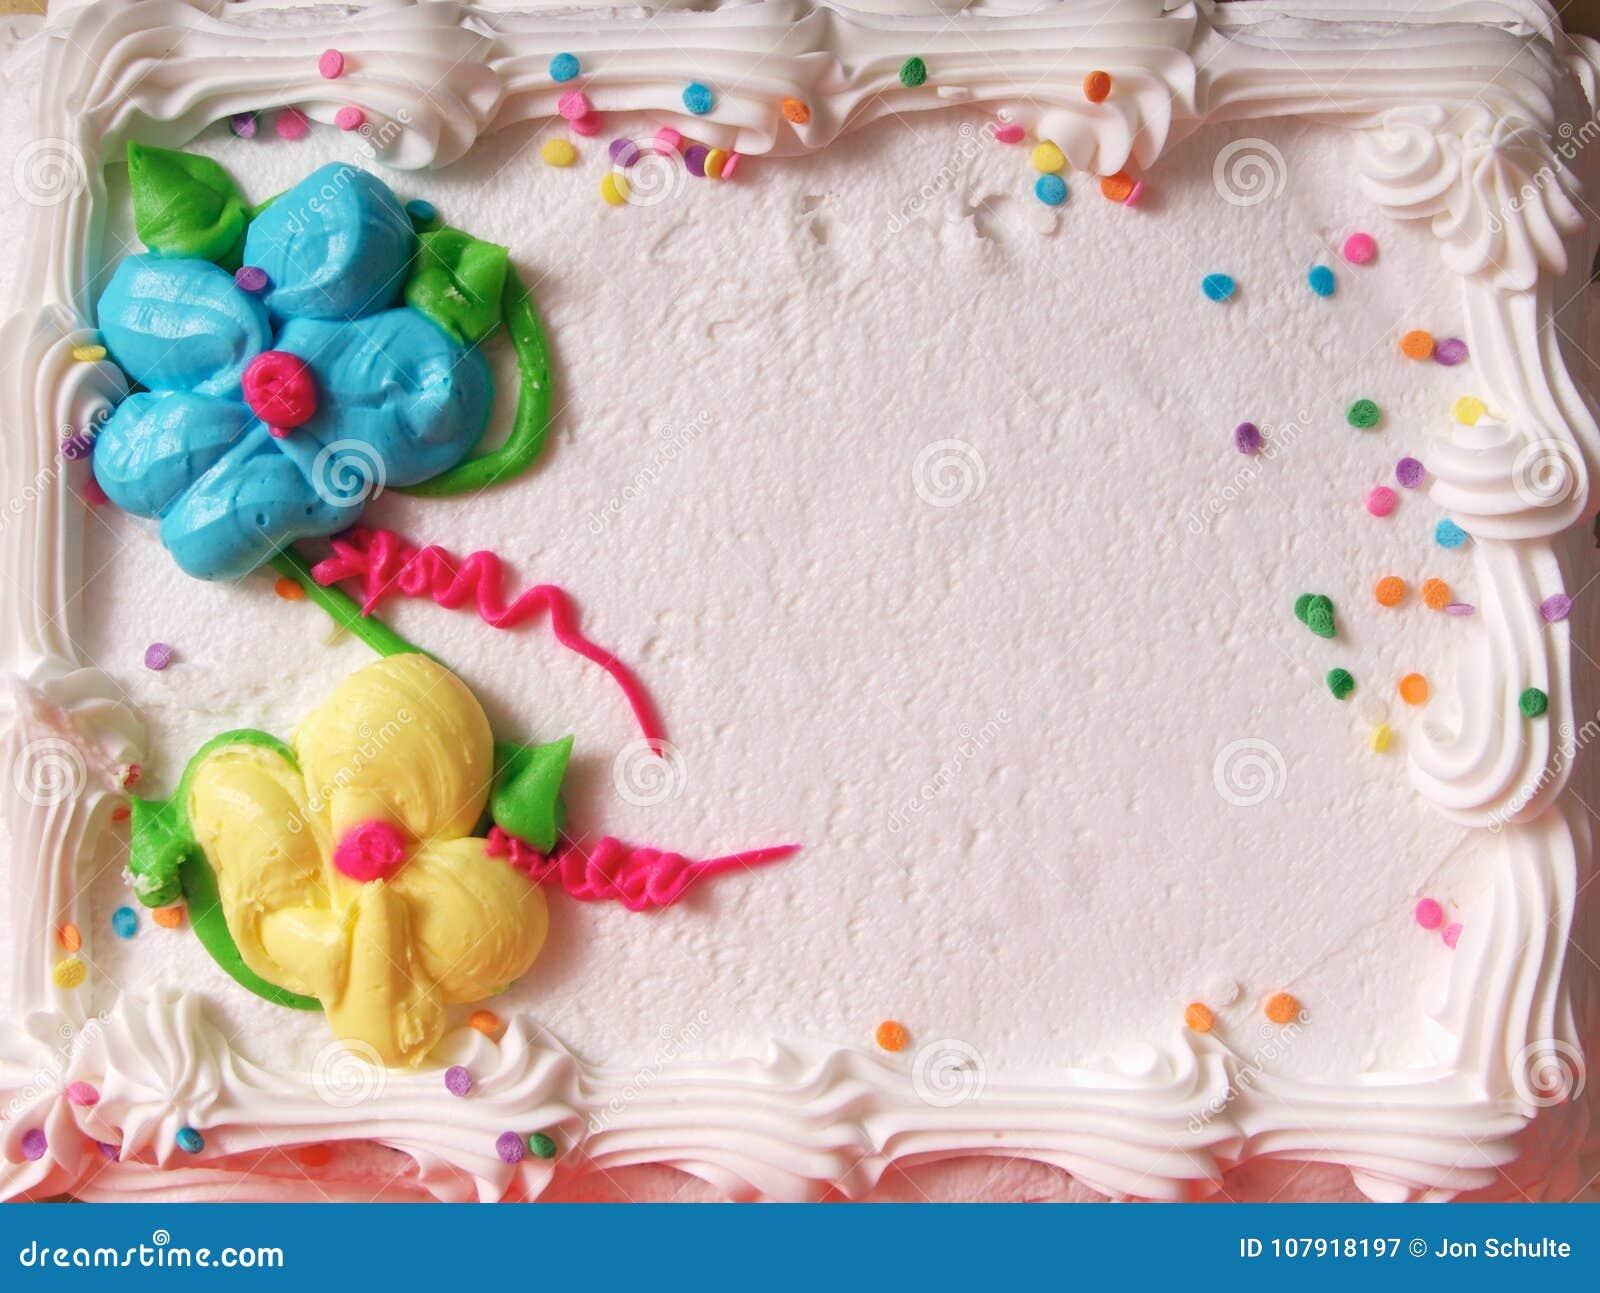 Incredible A Plain Birthday Cake Stock Image Image Of Clean Food 107918197 Funny Birthday Cards Online Elaedamsfinfo